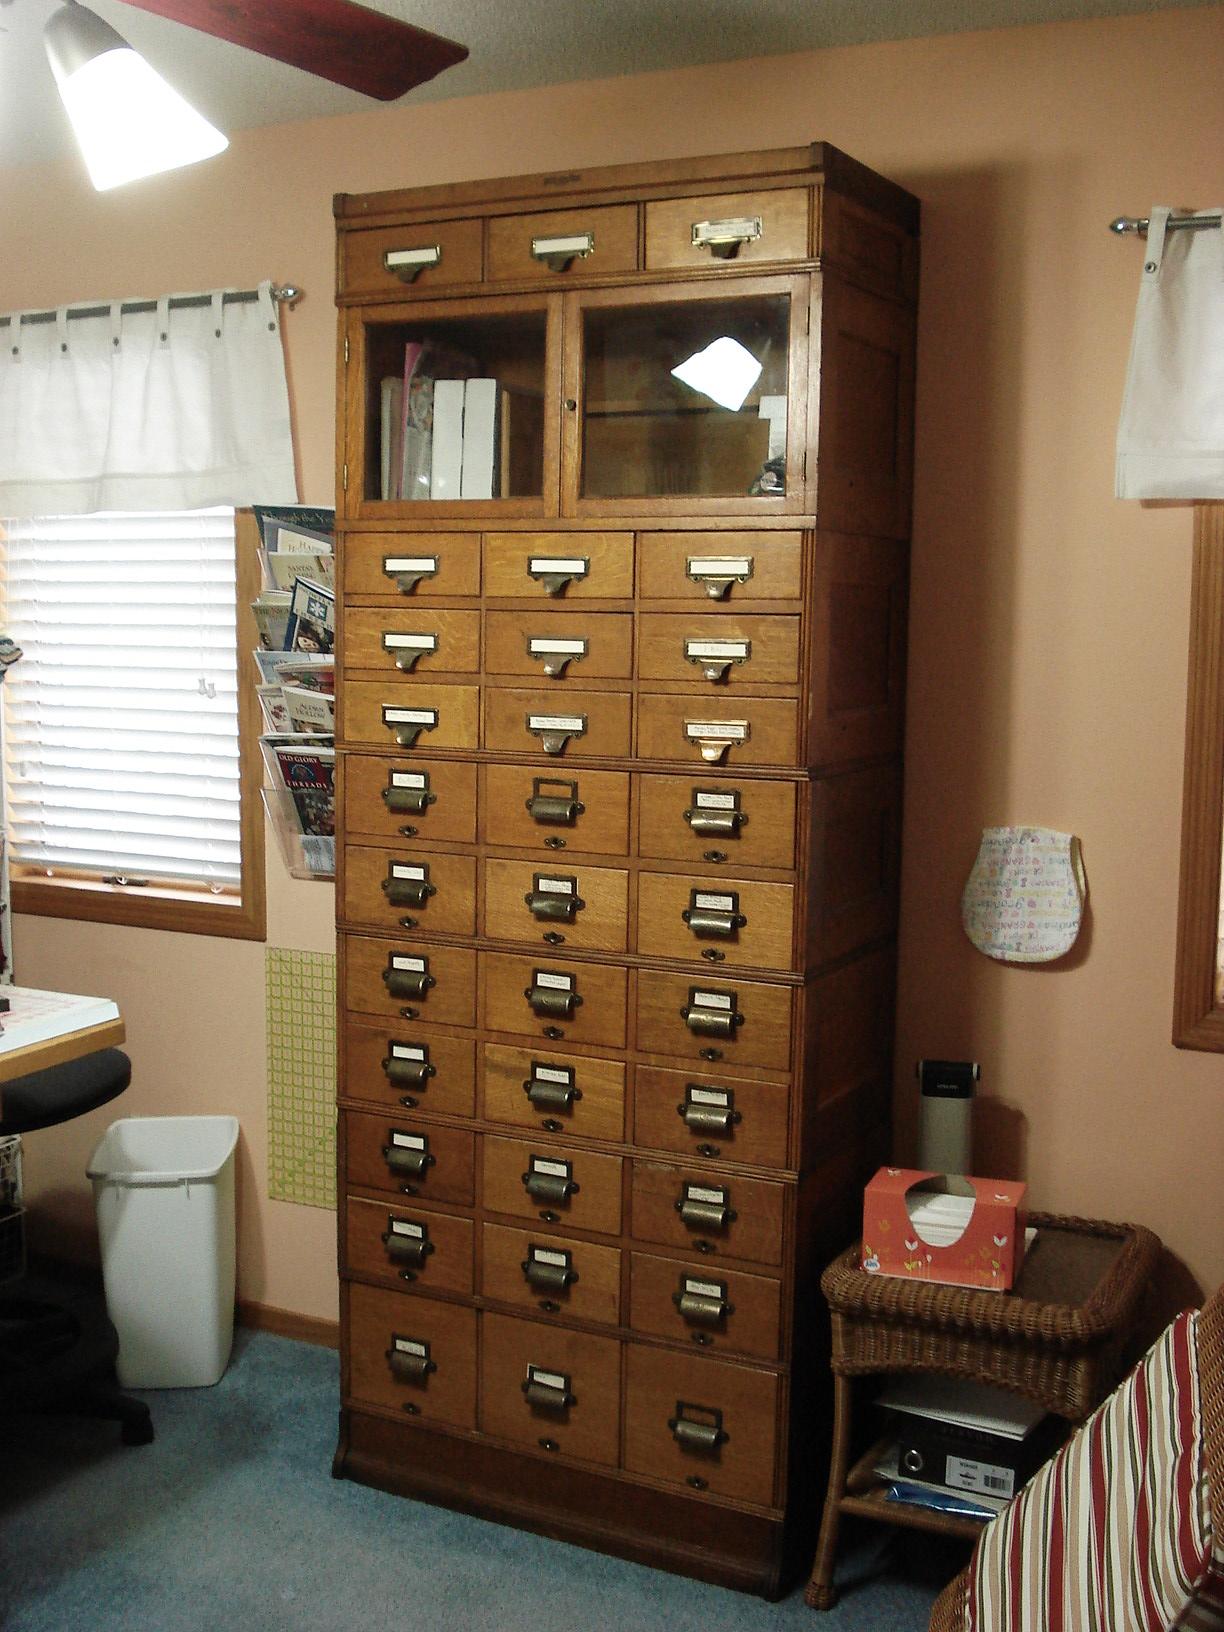 Yawman & Erbe file cabinet antique appraisal | InstAppraisal